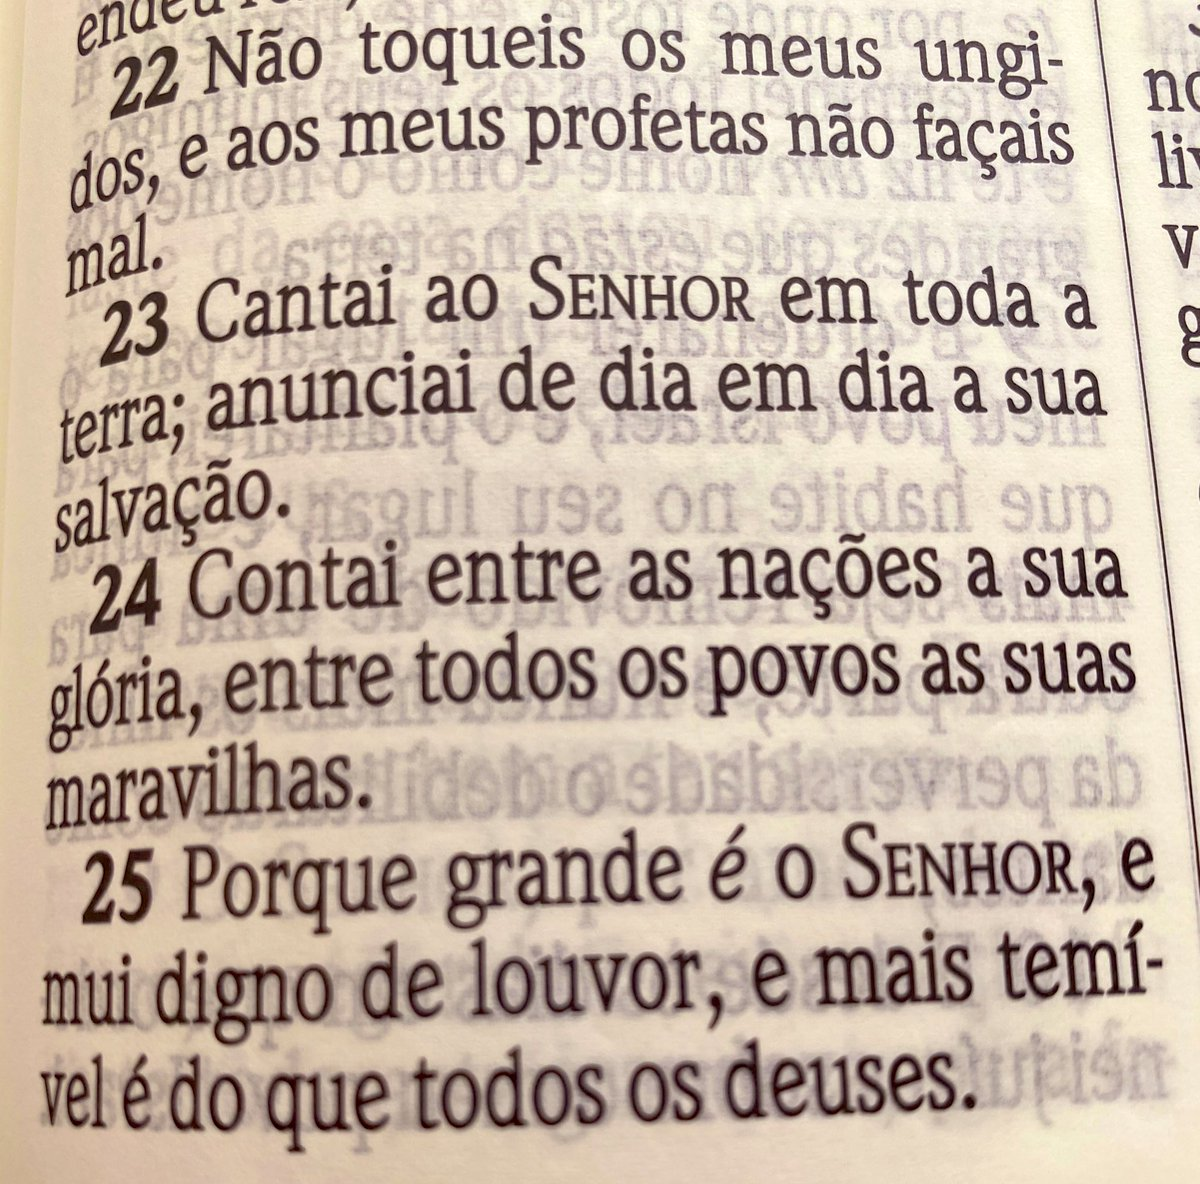 Meu devocional de hoje... 1Cro.16:22-25 . Se quiser ... pode compartilhar! . Deus abençoe o teu dia 🙏🏻🙌🏻  .  Amém & Amém 😭 https://t.co/224B45ZK3T